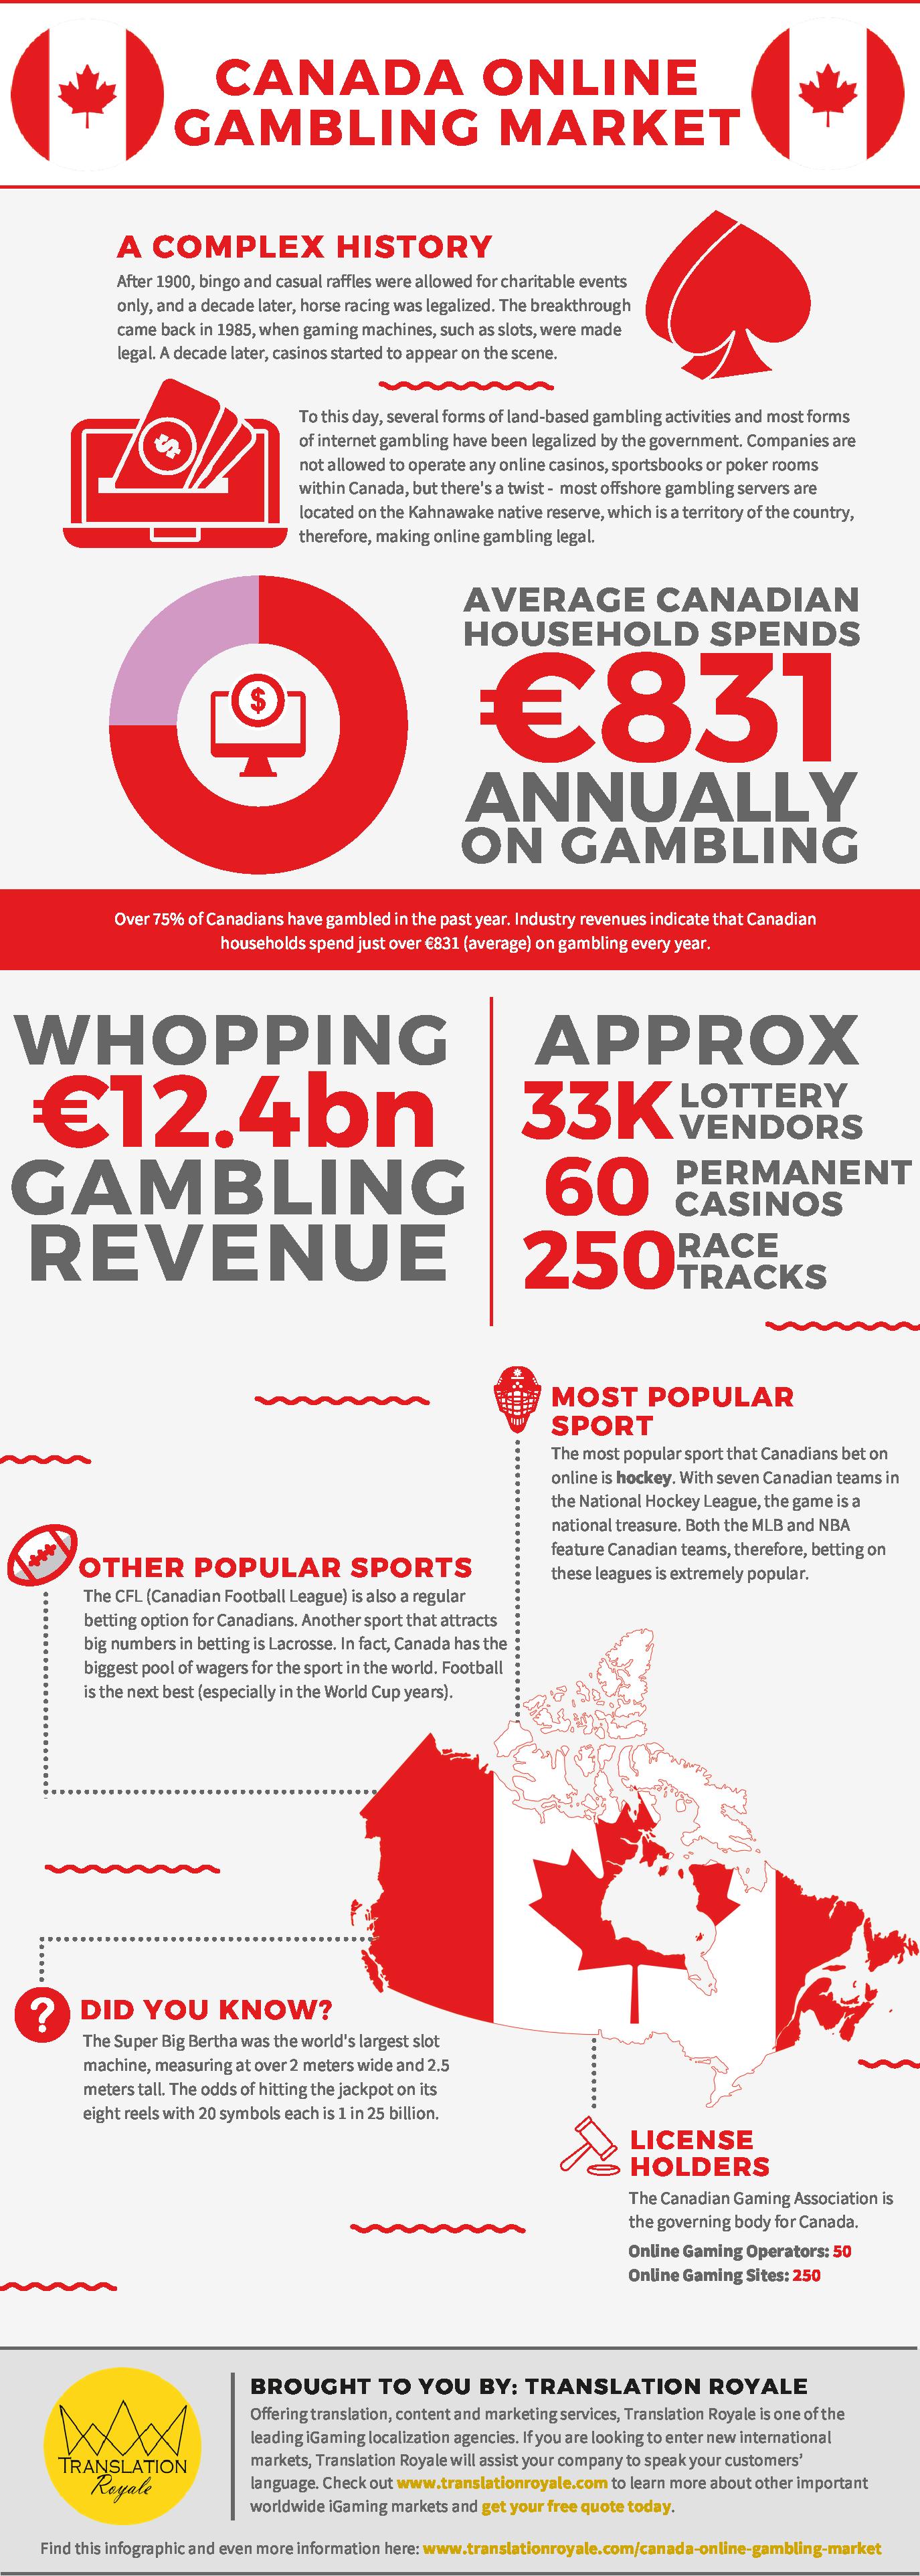 Canada Online Gambling Market Infographic